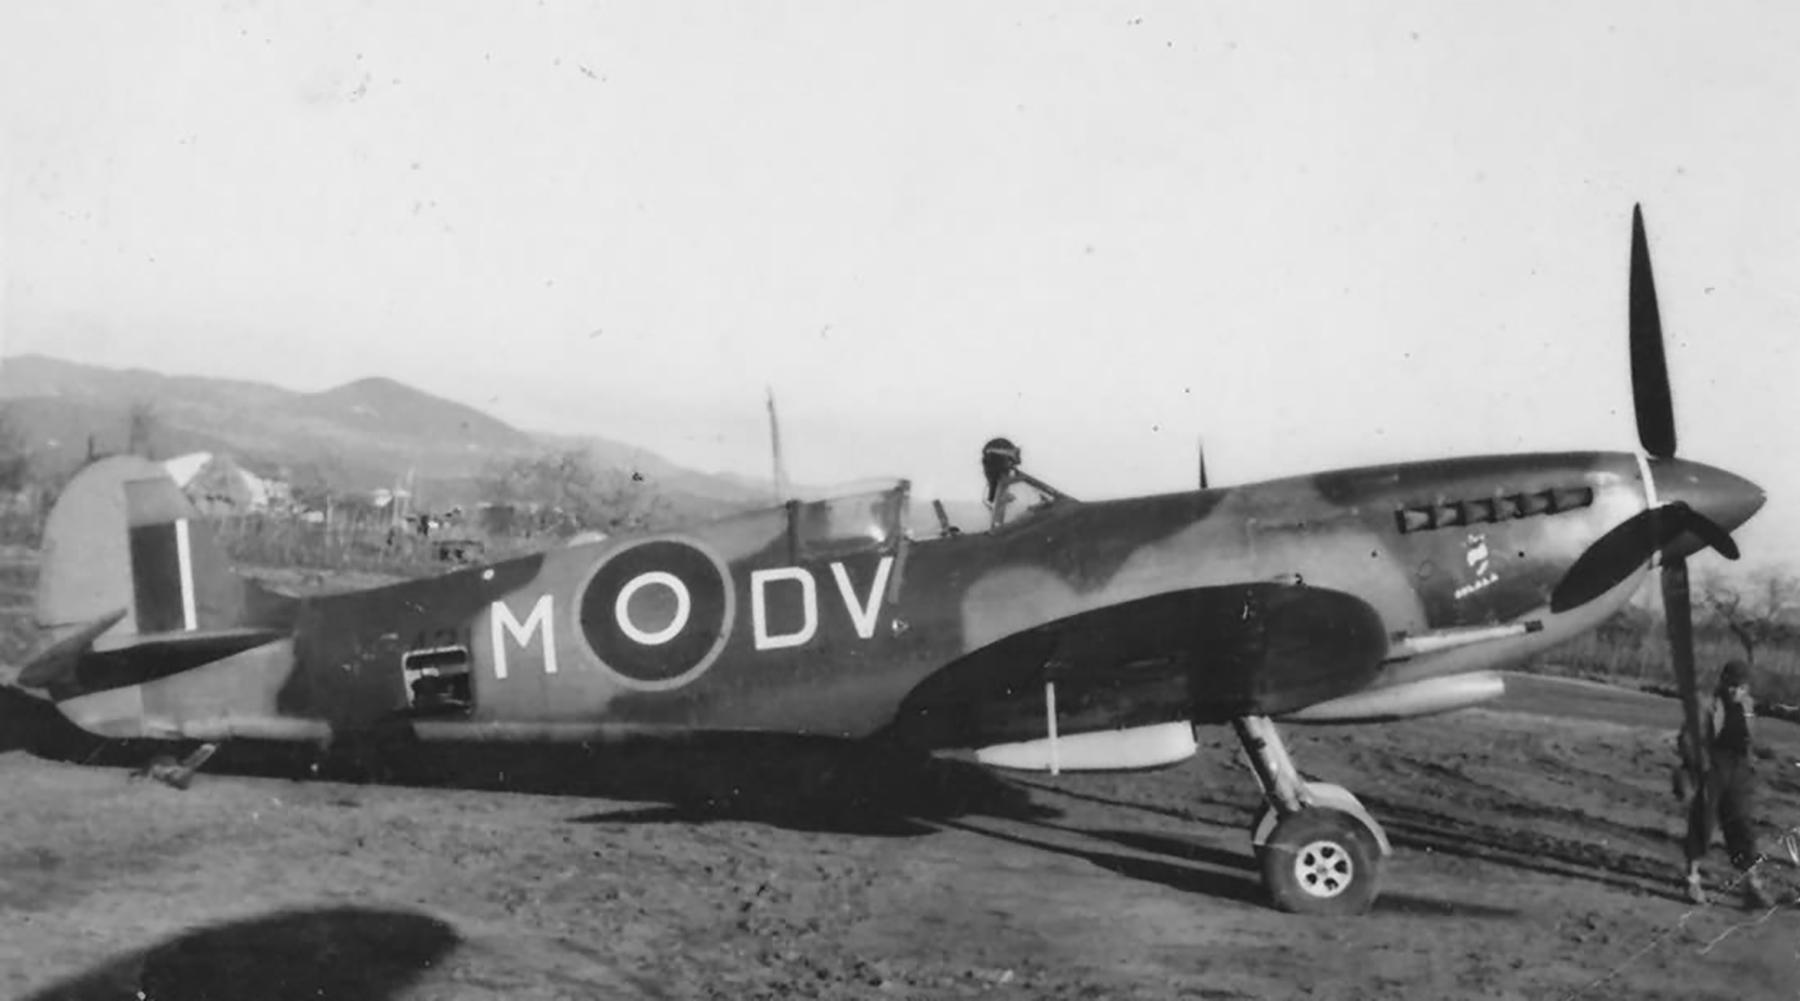 Spitfire MkIX RAF 129Sqn DVM MH384 England Aug 1943 web 01